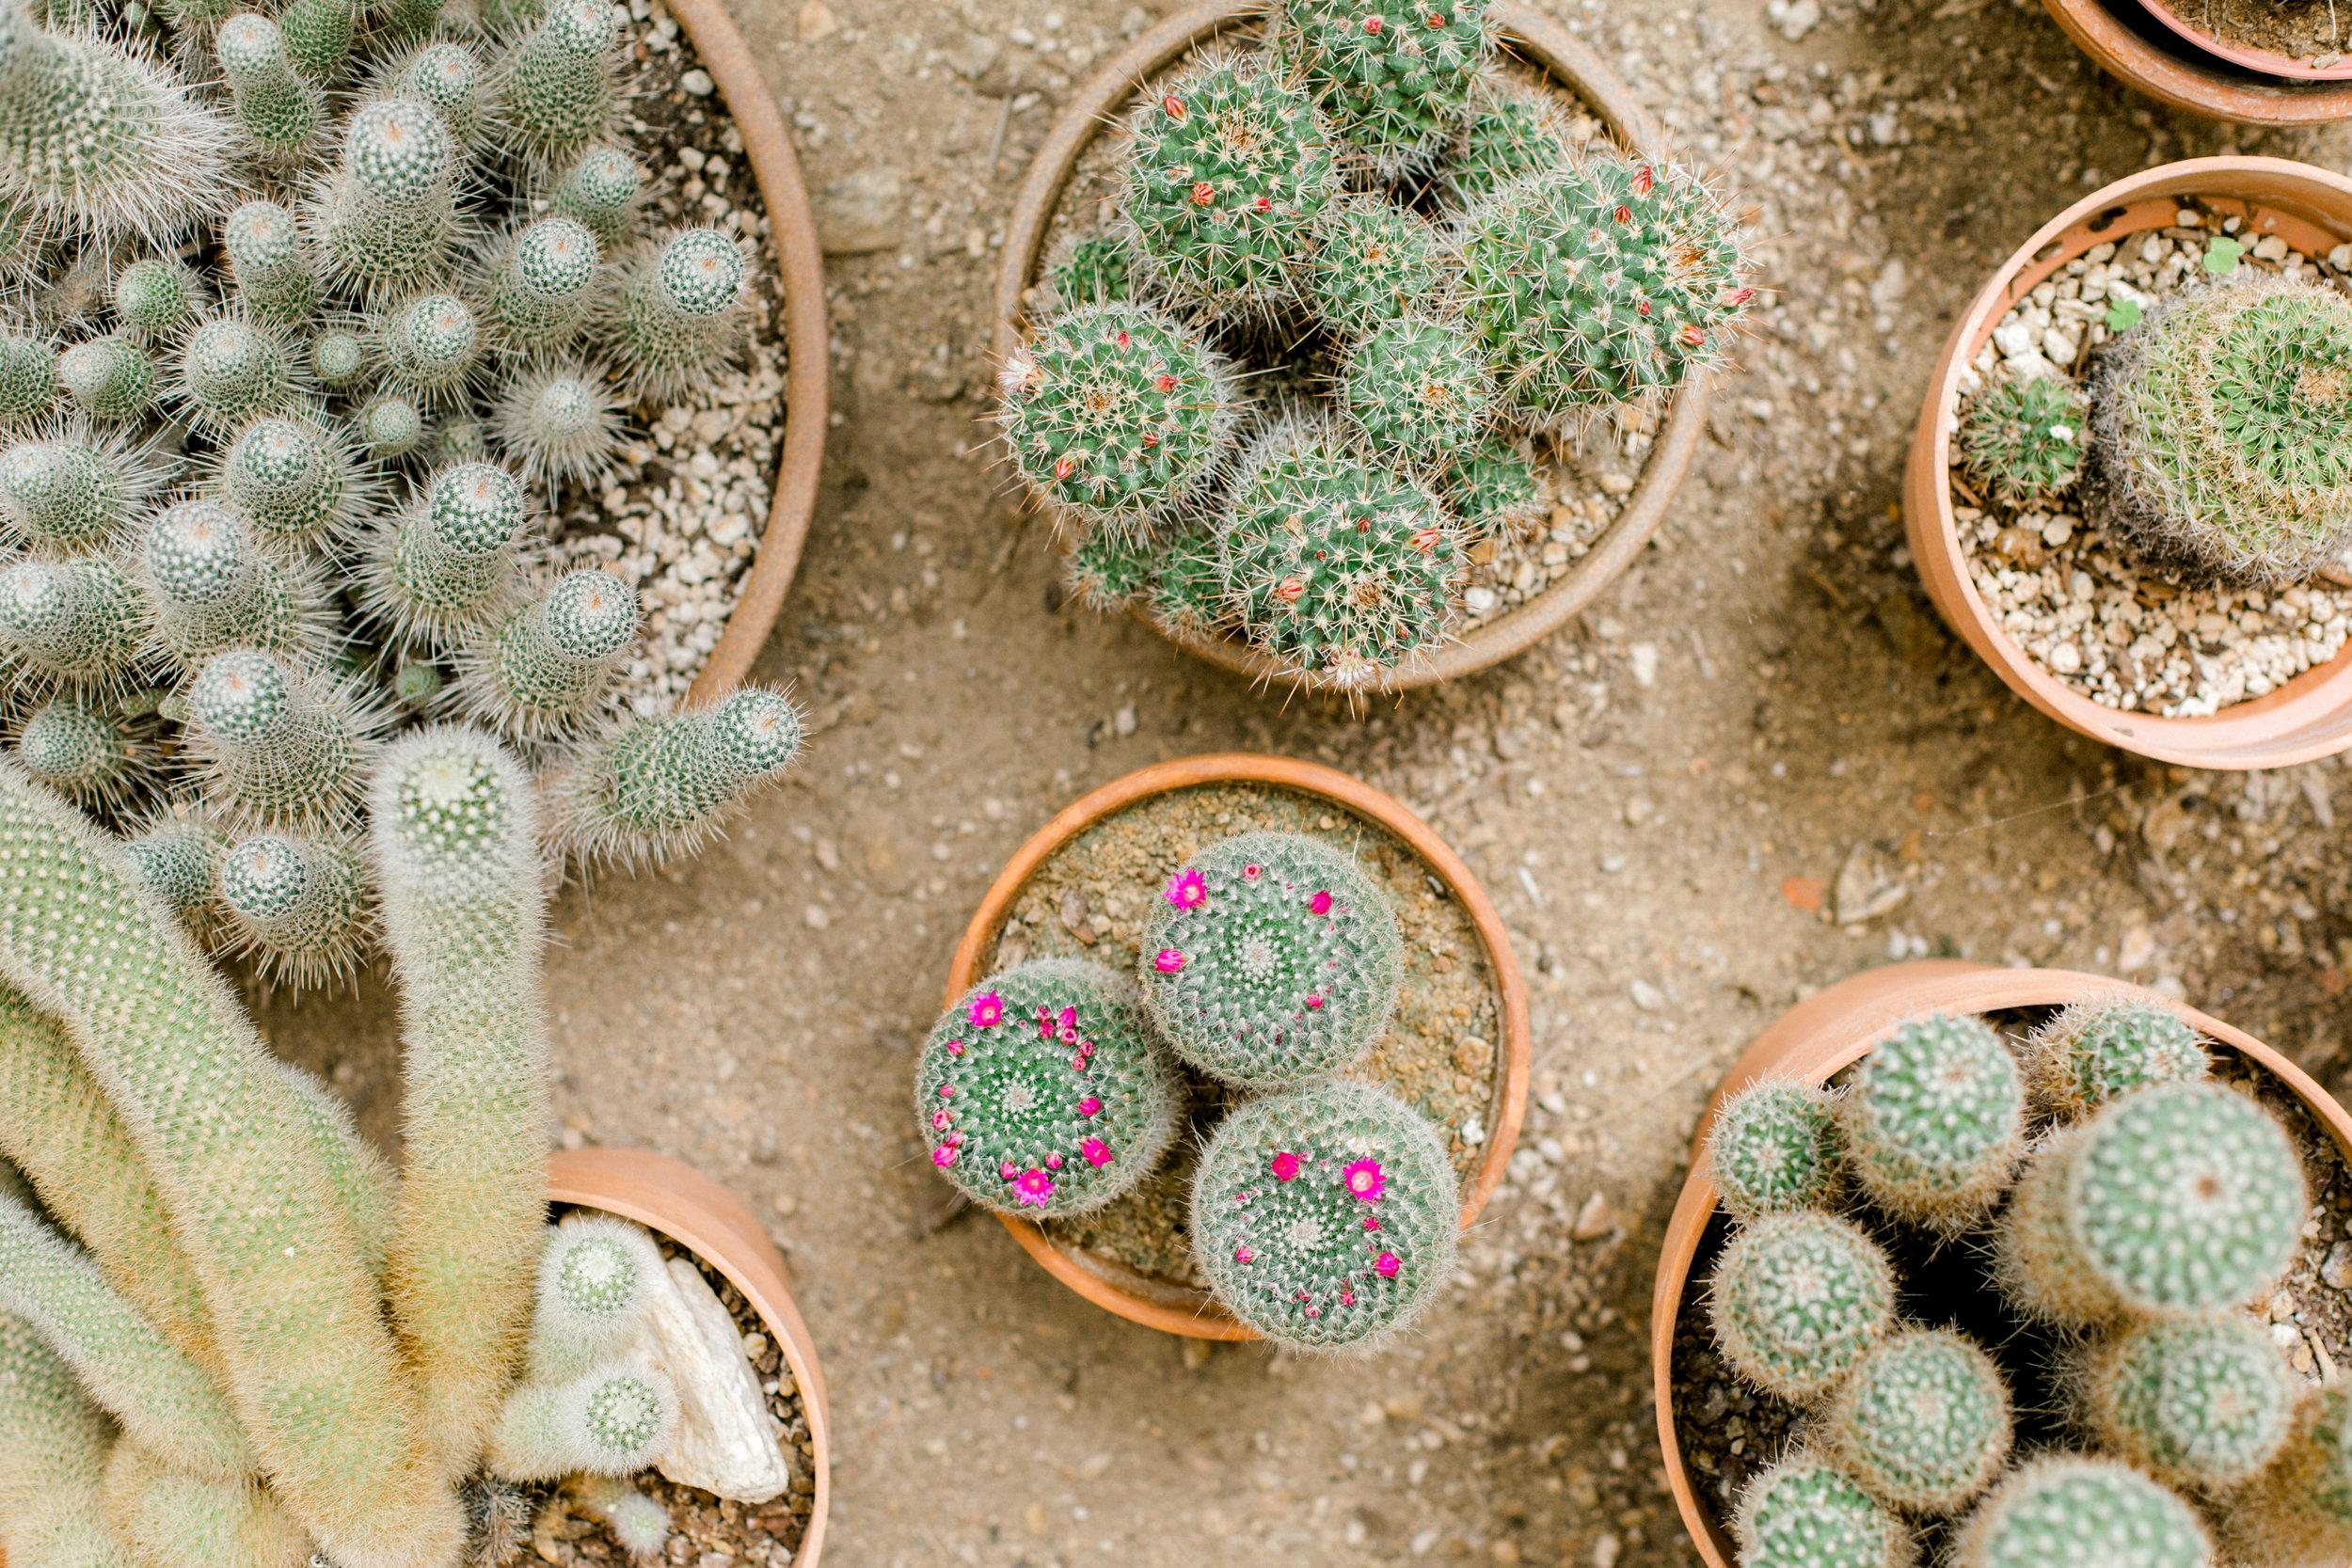 Jessica Sgubin Photography Atlanta Portrait photographer los angeles la salvation mountain greenhouse cactus garden moorten botanical garden cabazon dinosaurs santa monica joshua tree-50.jpg